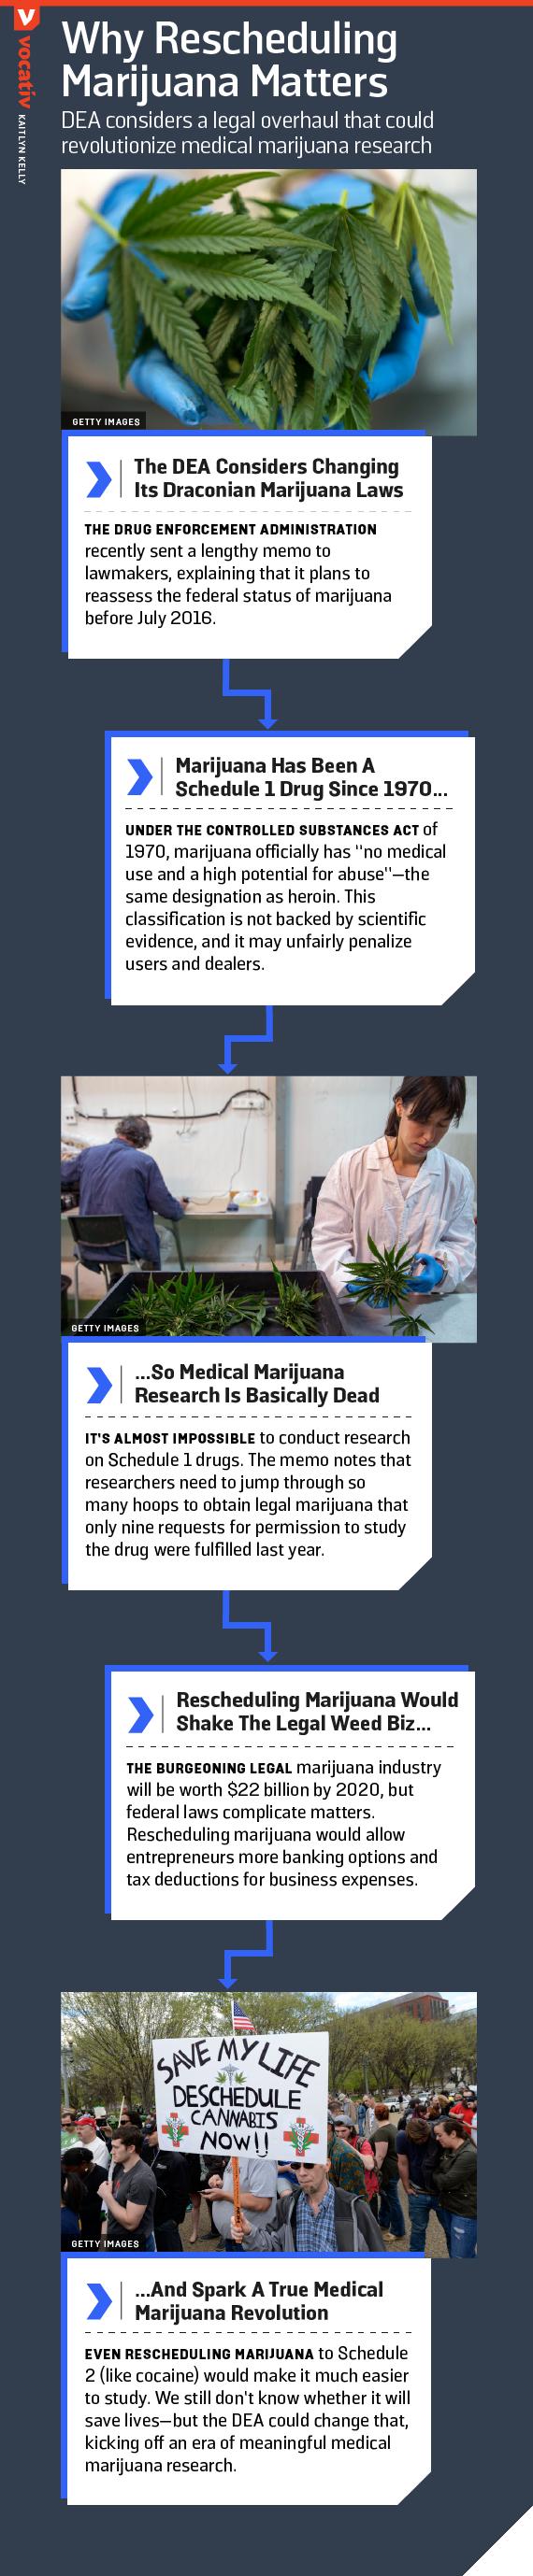 DEA considers a legal overhaul that could revolutionize medical marijuana research